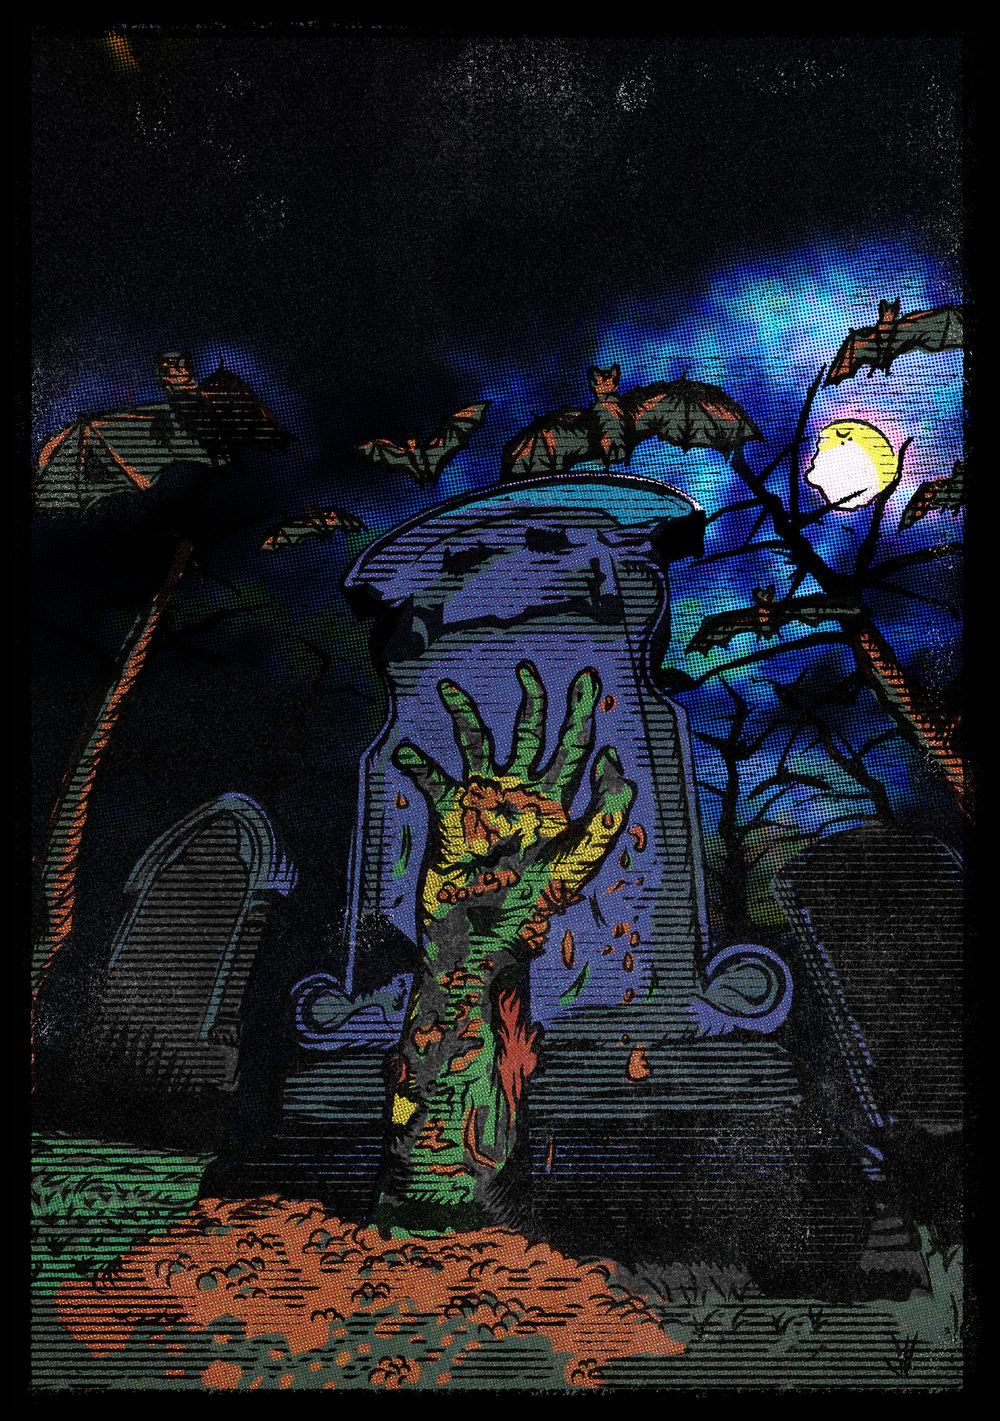 PureHorror-04-03-no-text.jpg